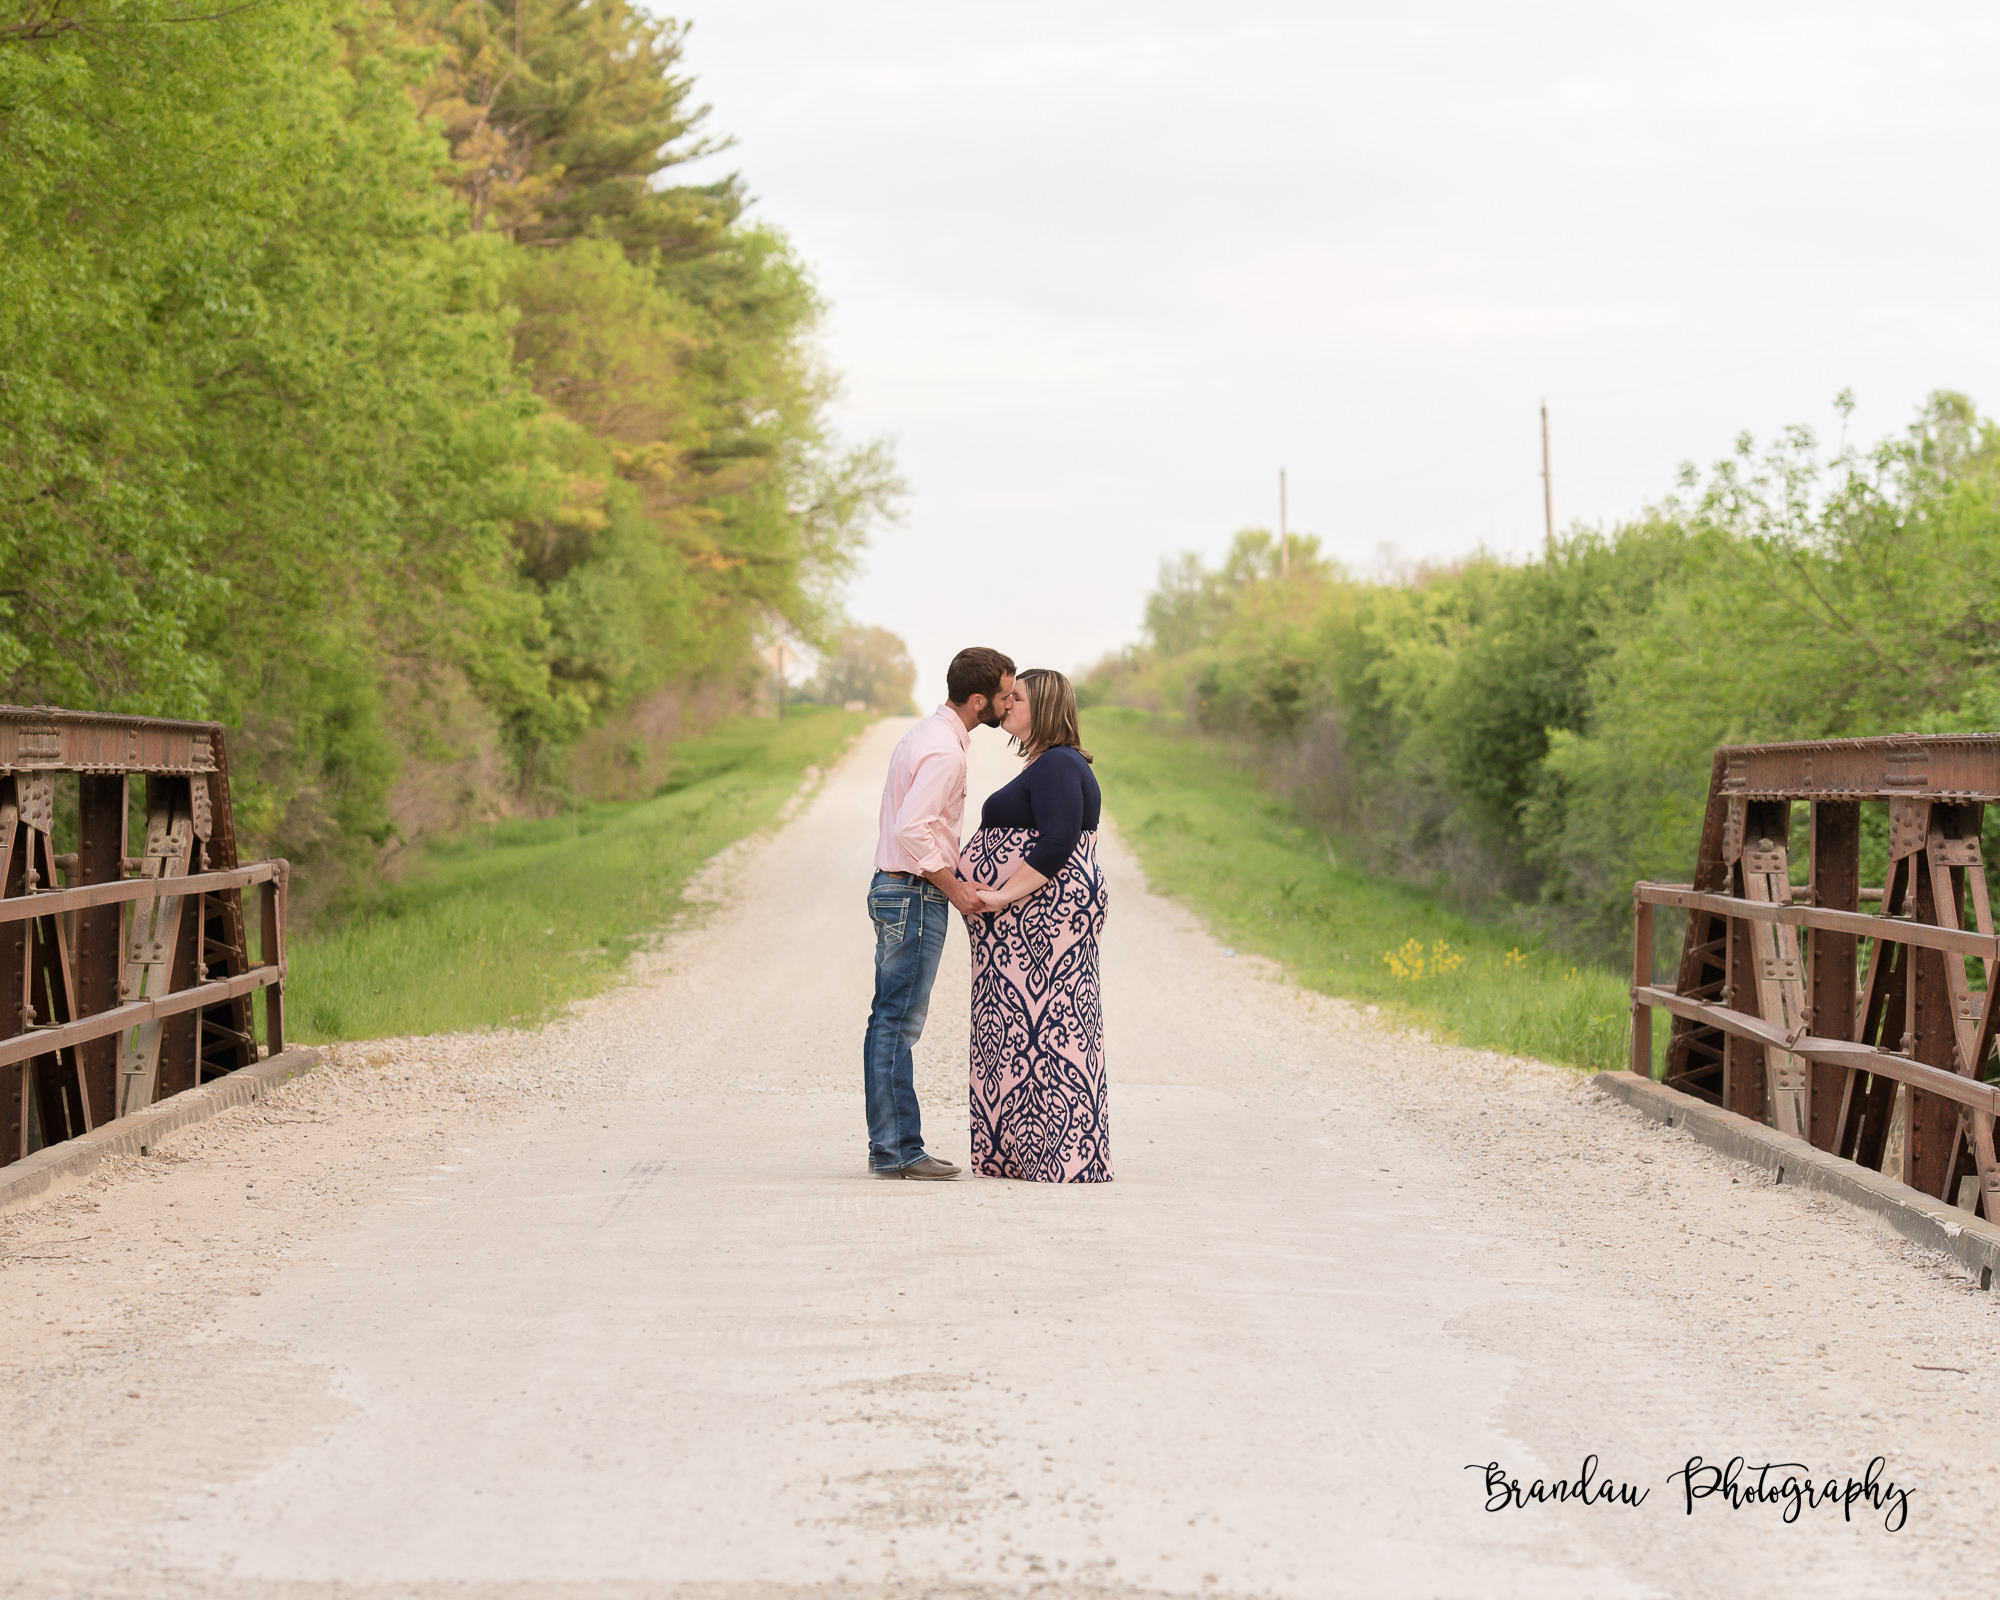 Engagement Bridge North Central Iowa_Brandau Photography-25.jpg